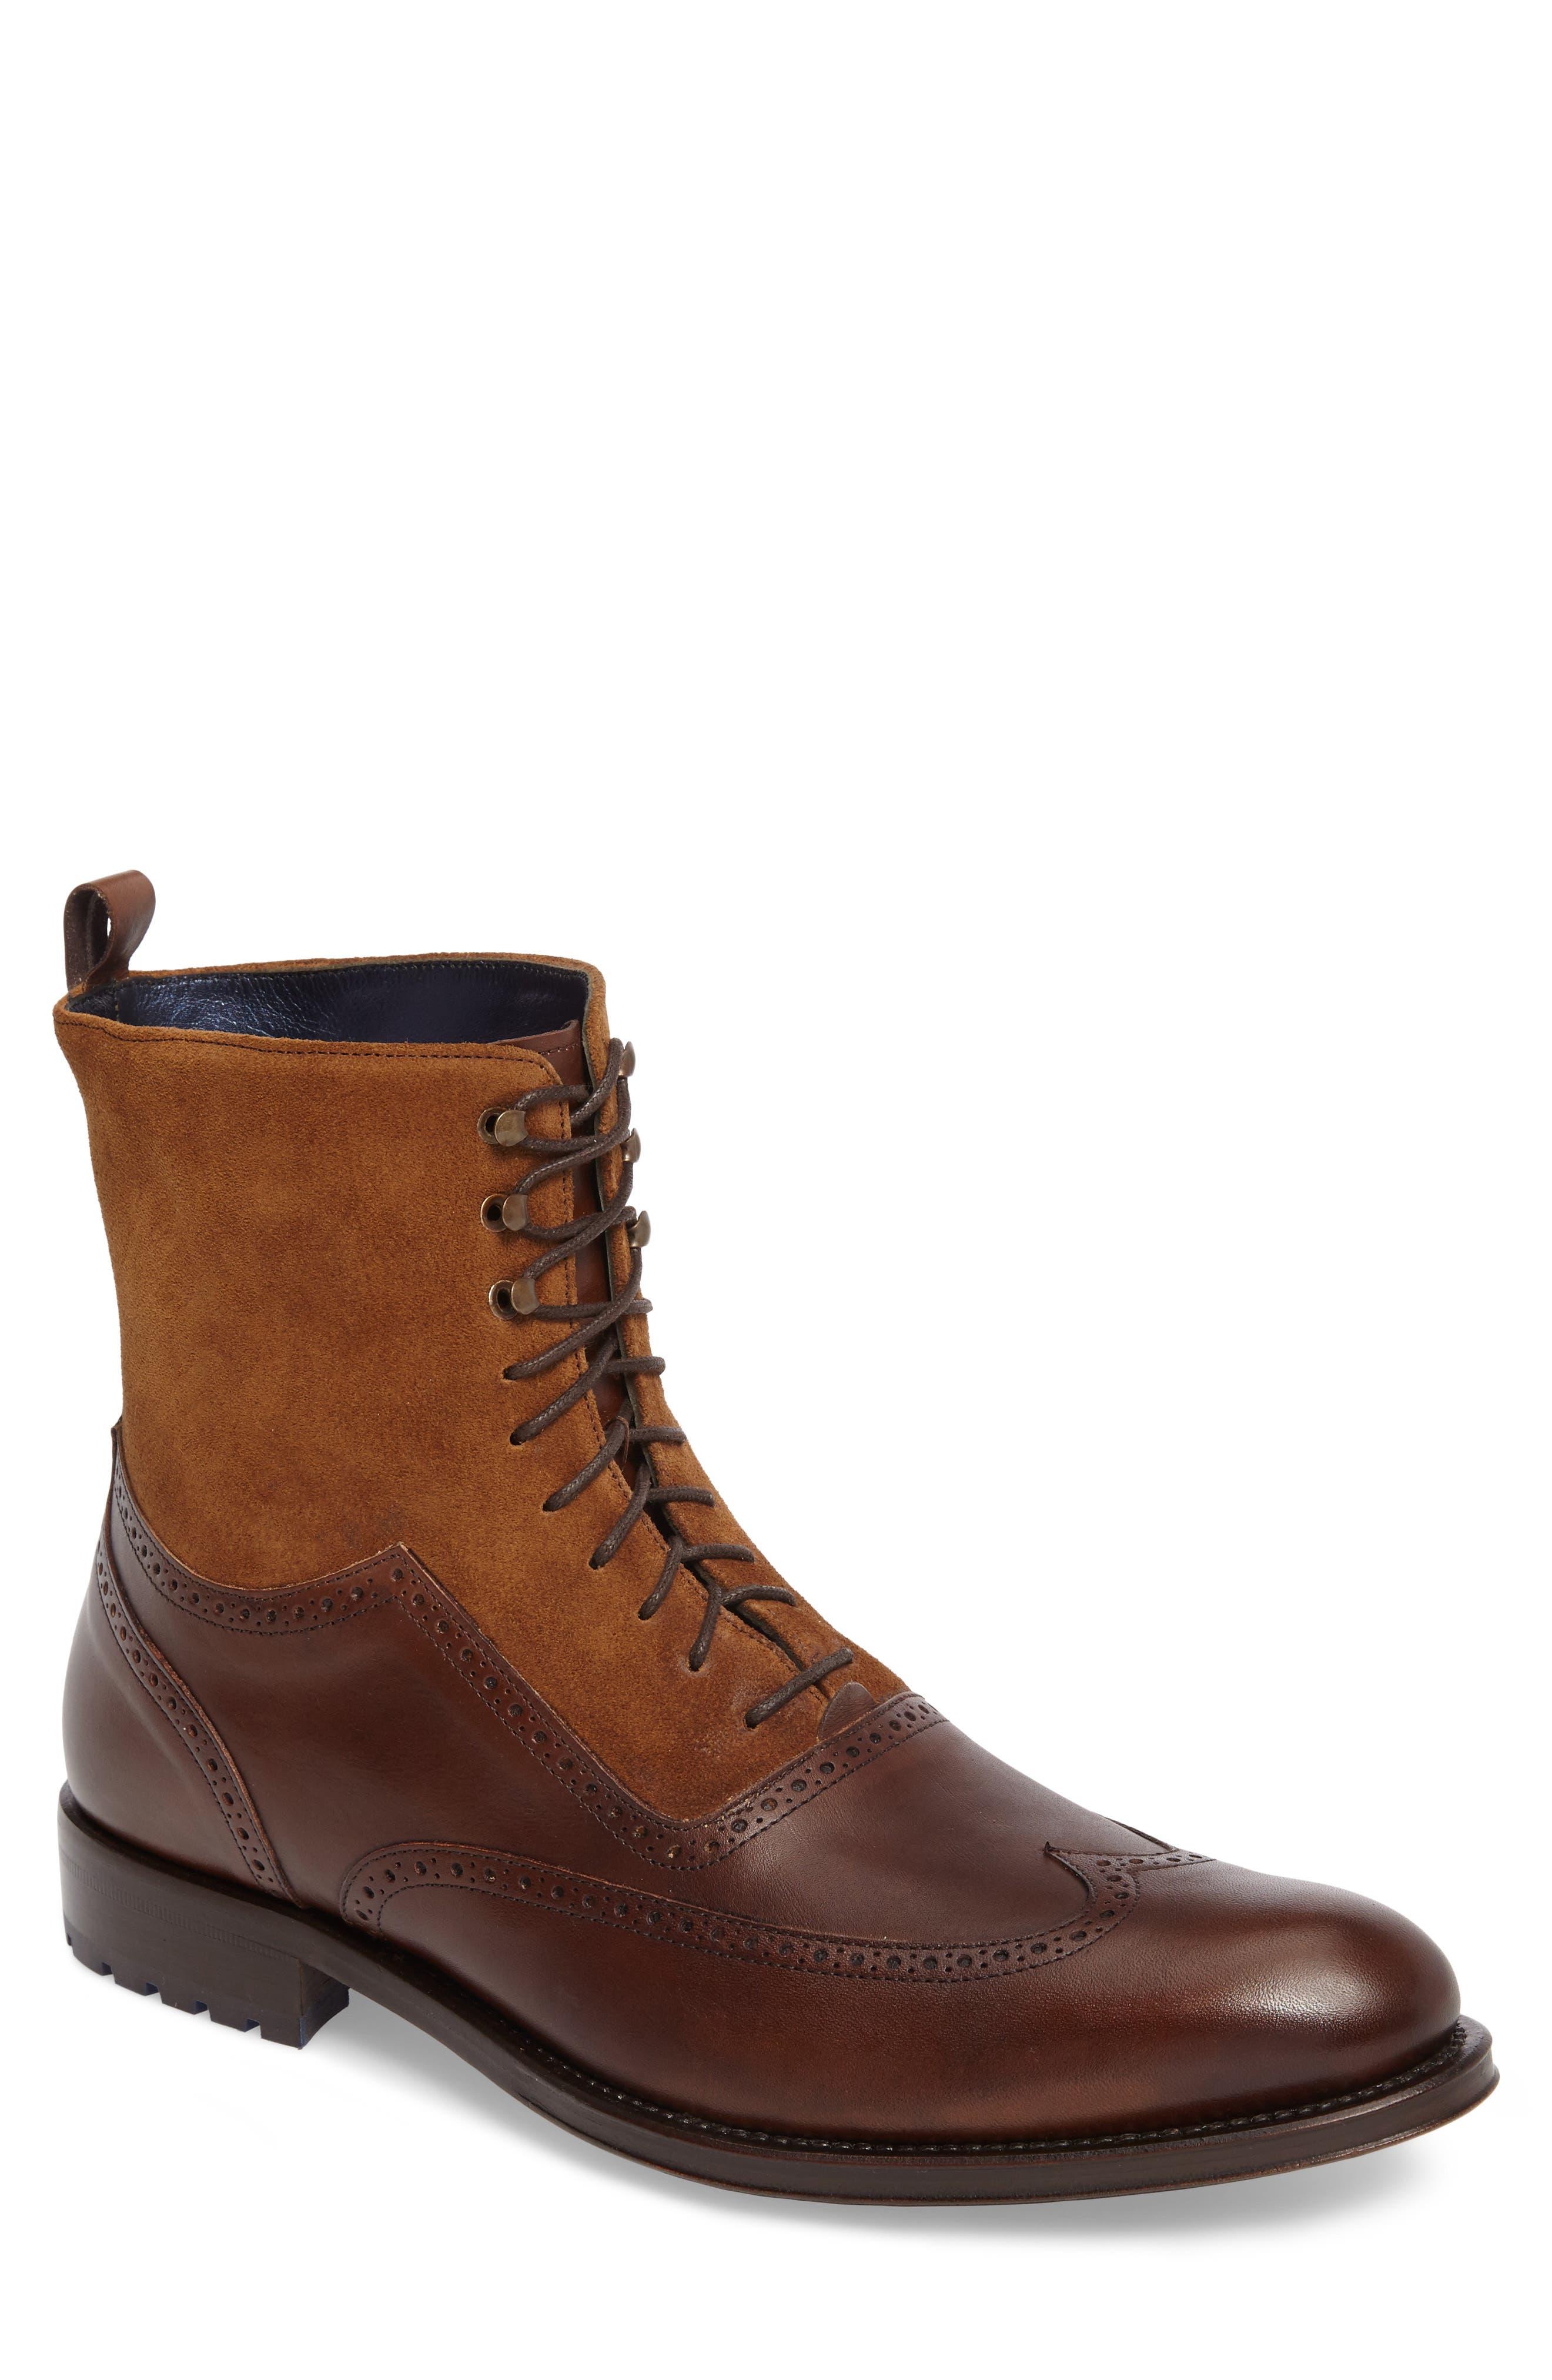 Alternate Image 1 Selected - Mezlan Benalva Wingtip Boot (Men)